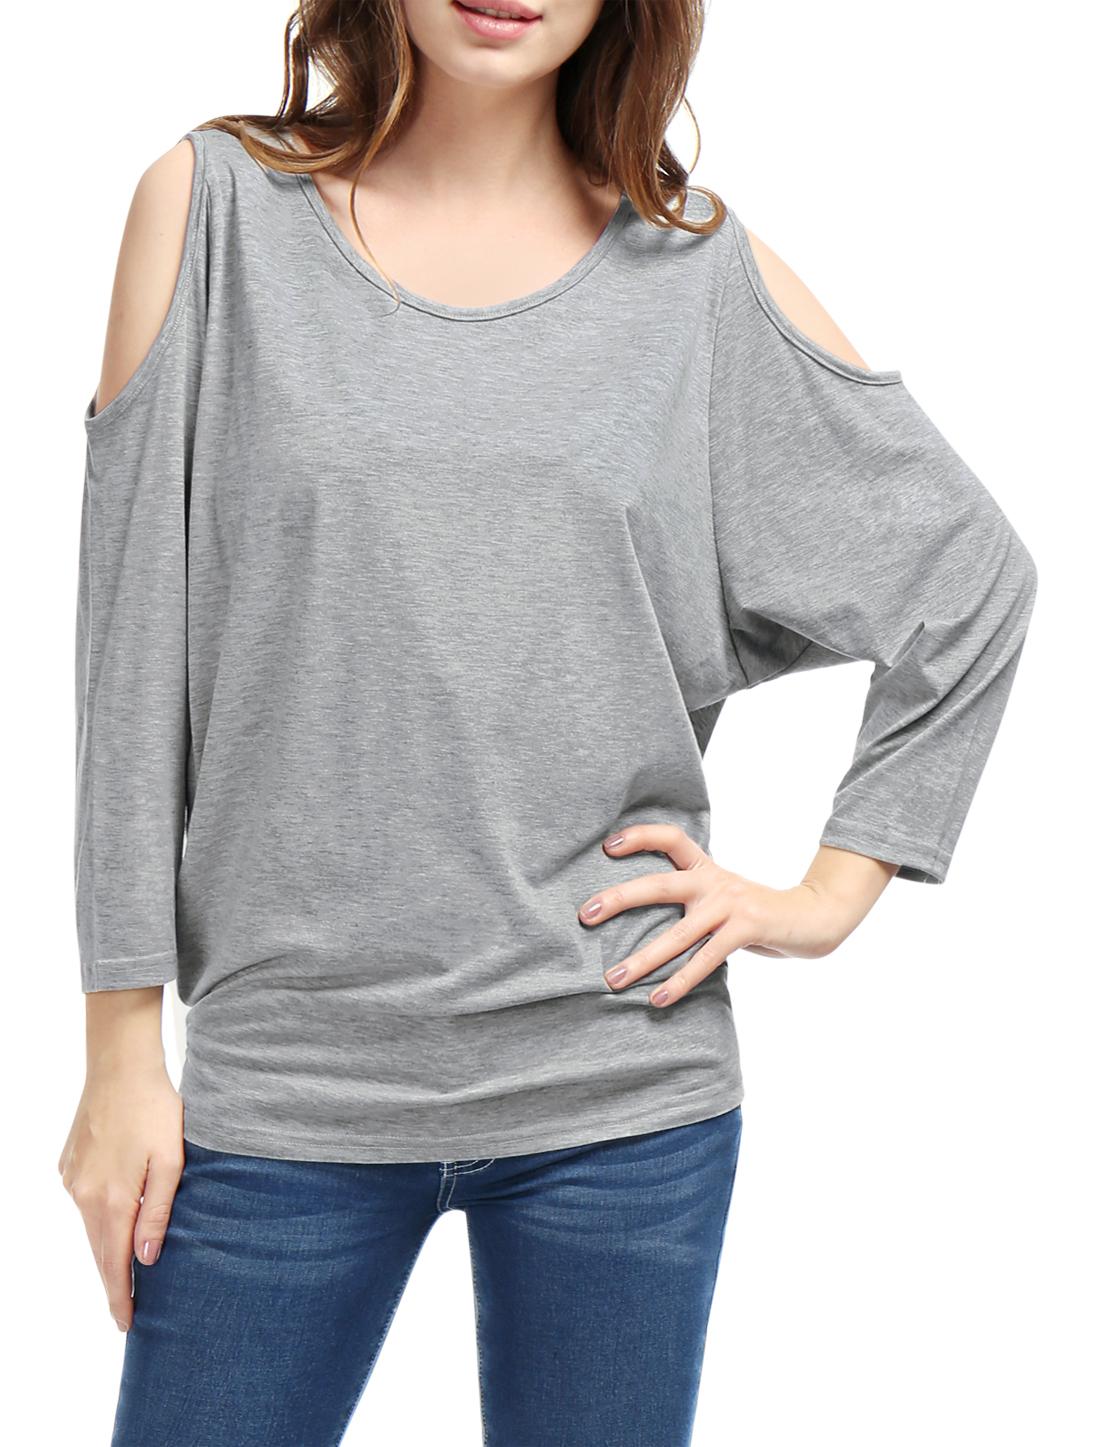 Women Leisure Design Long Batwing Sleeves Gray Top Shirt 1X